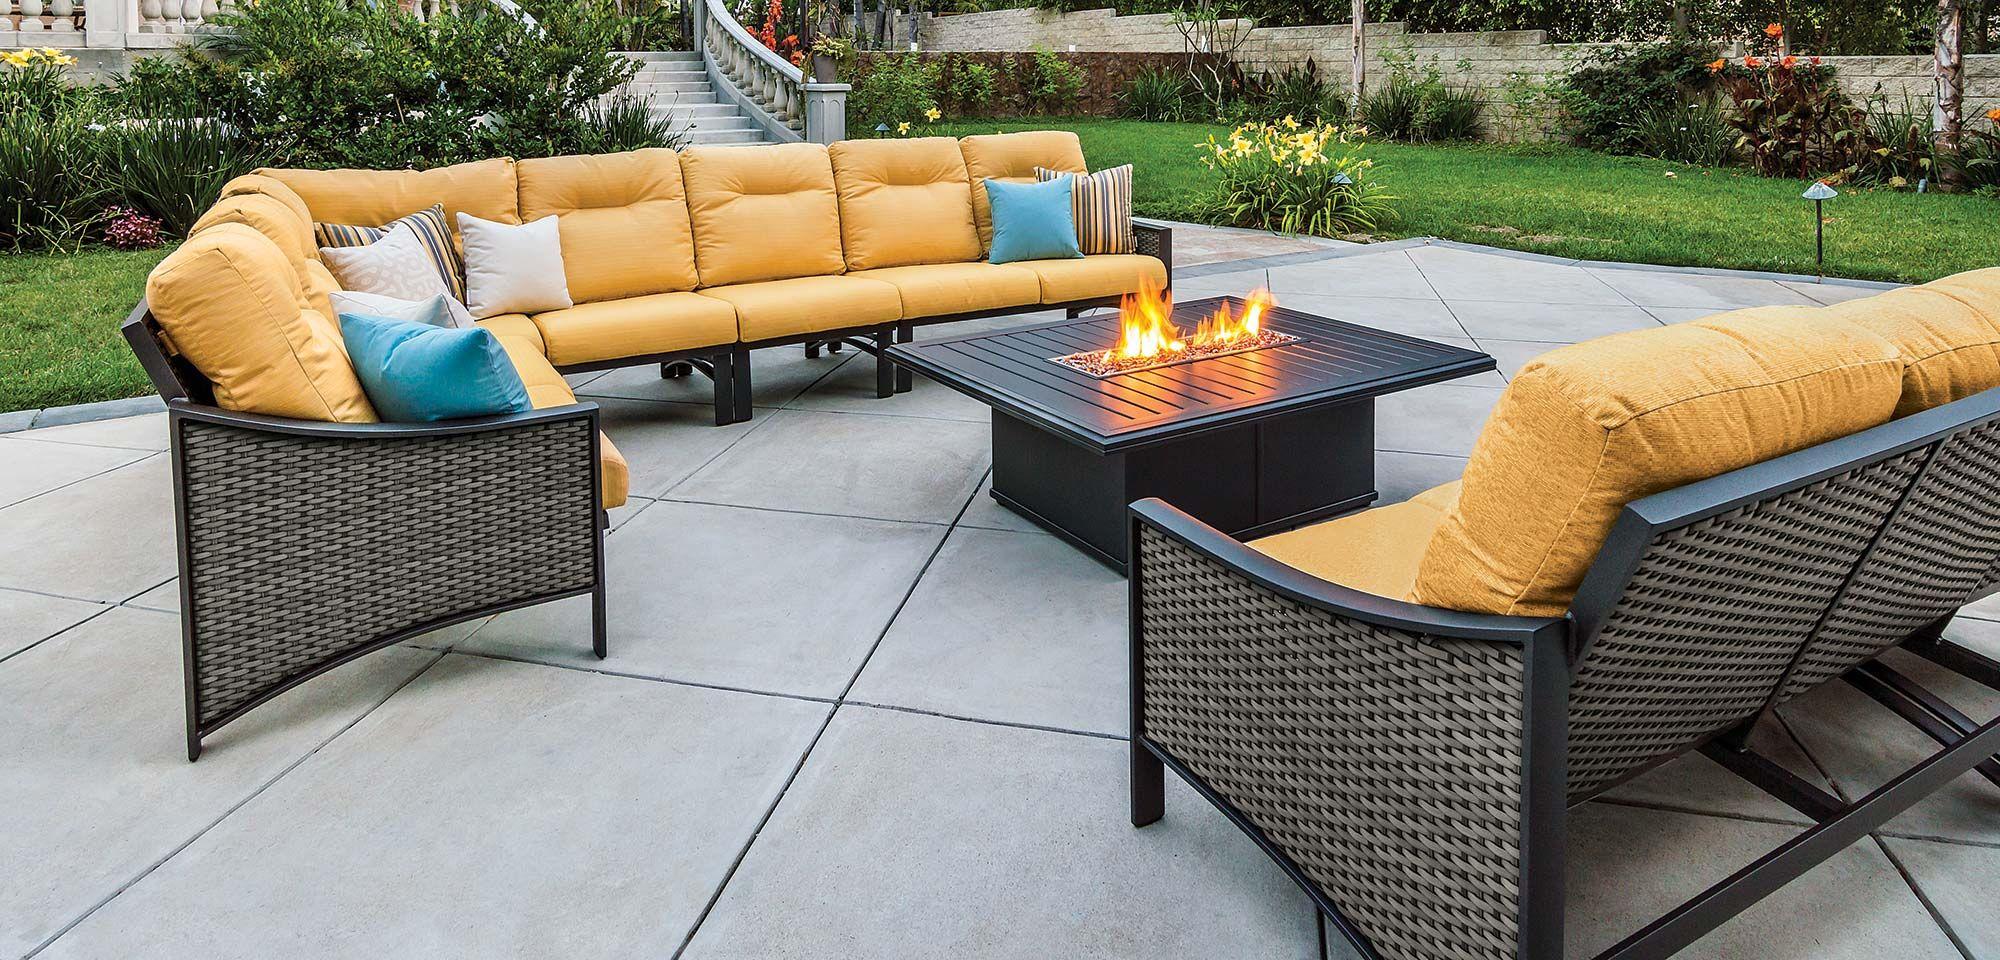 Jax Outdoor Furniture Cool Storage Furniture Check more at